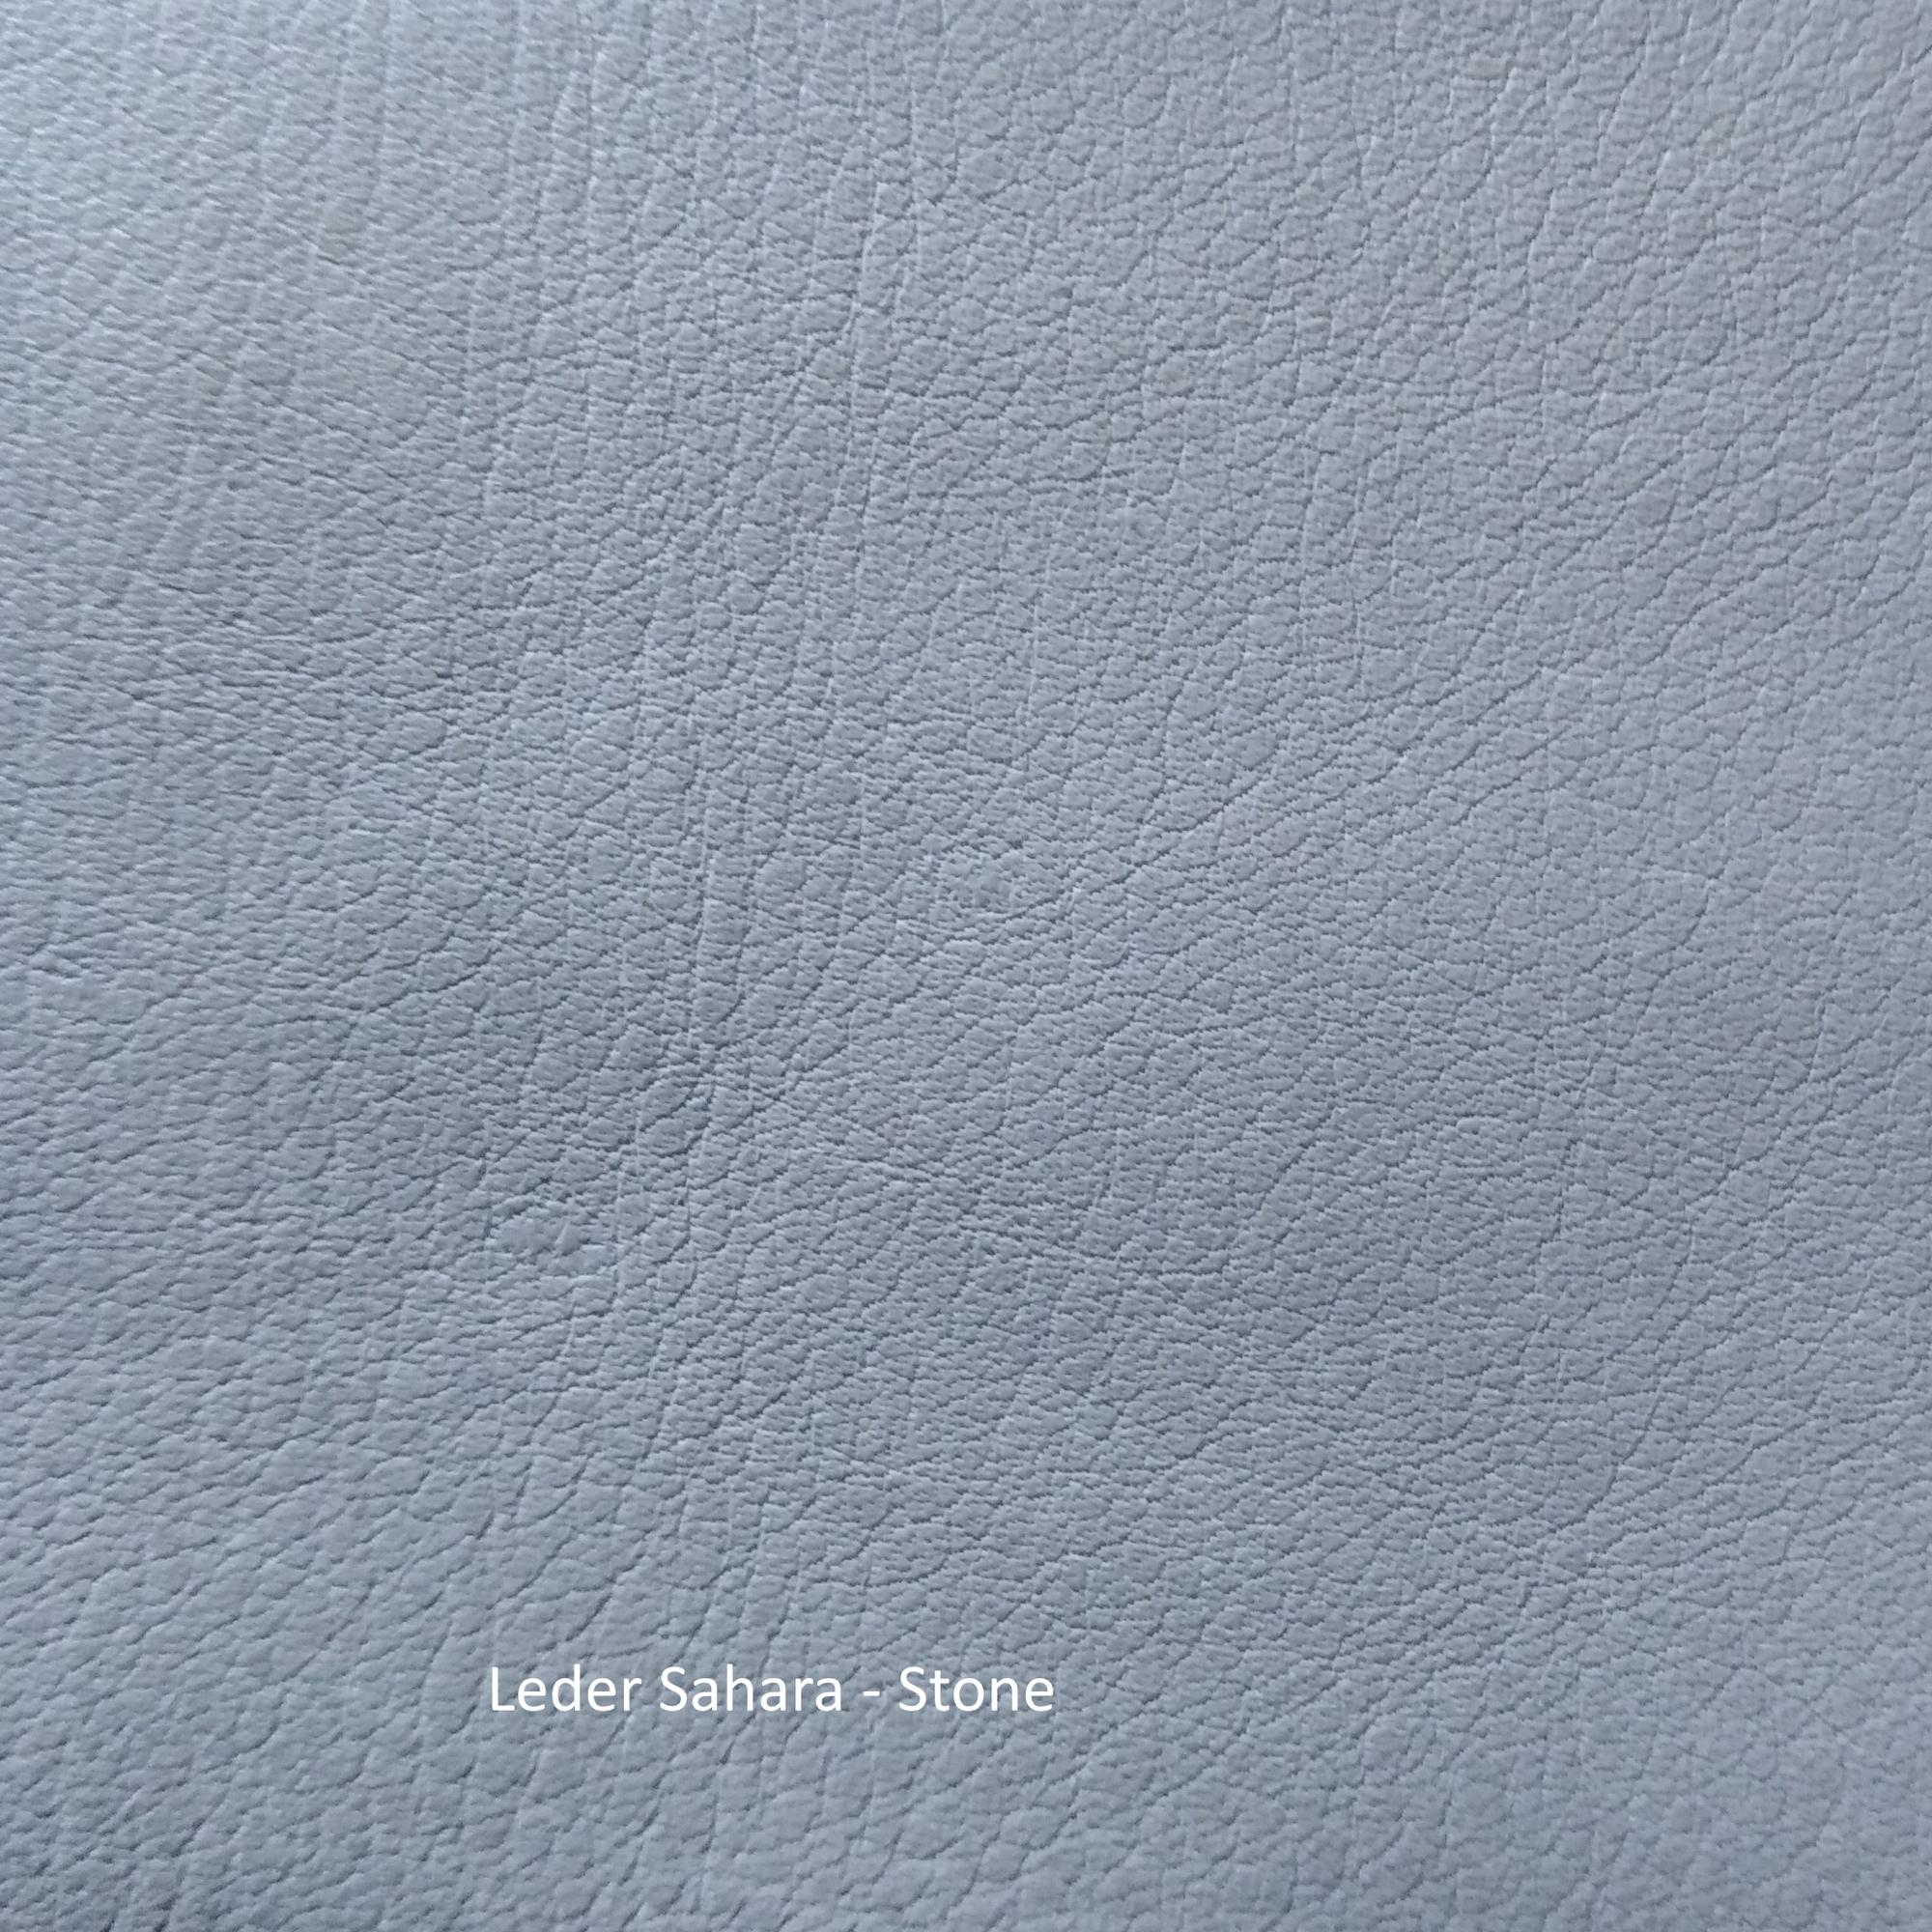 Ledermusterkarte Sahara Freifrau Sitzmöbelmanufaktur